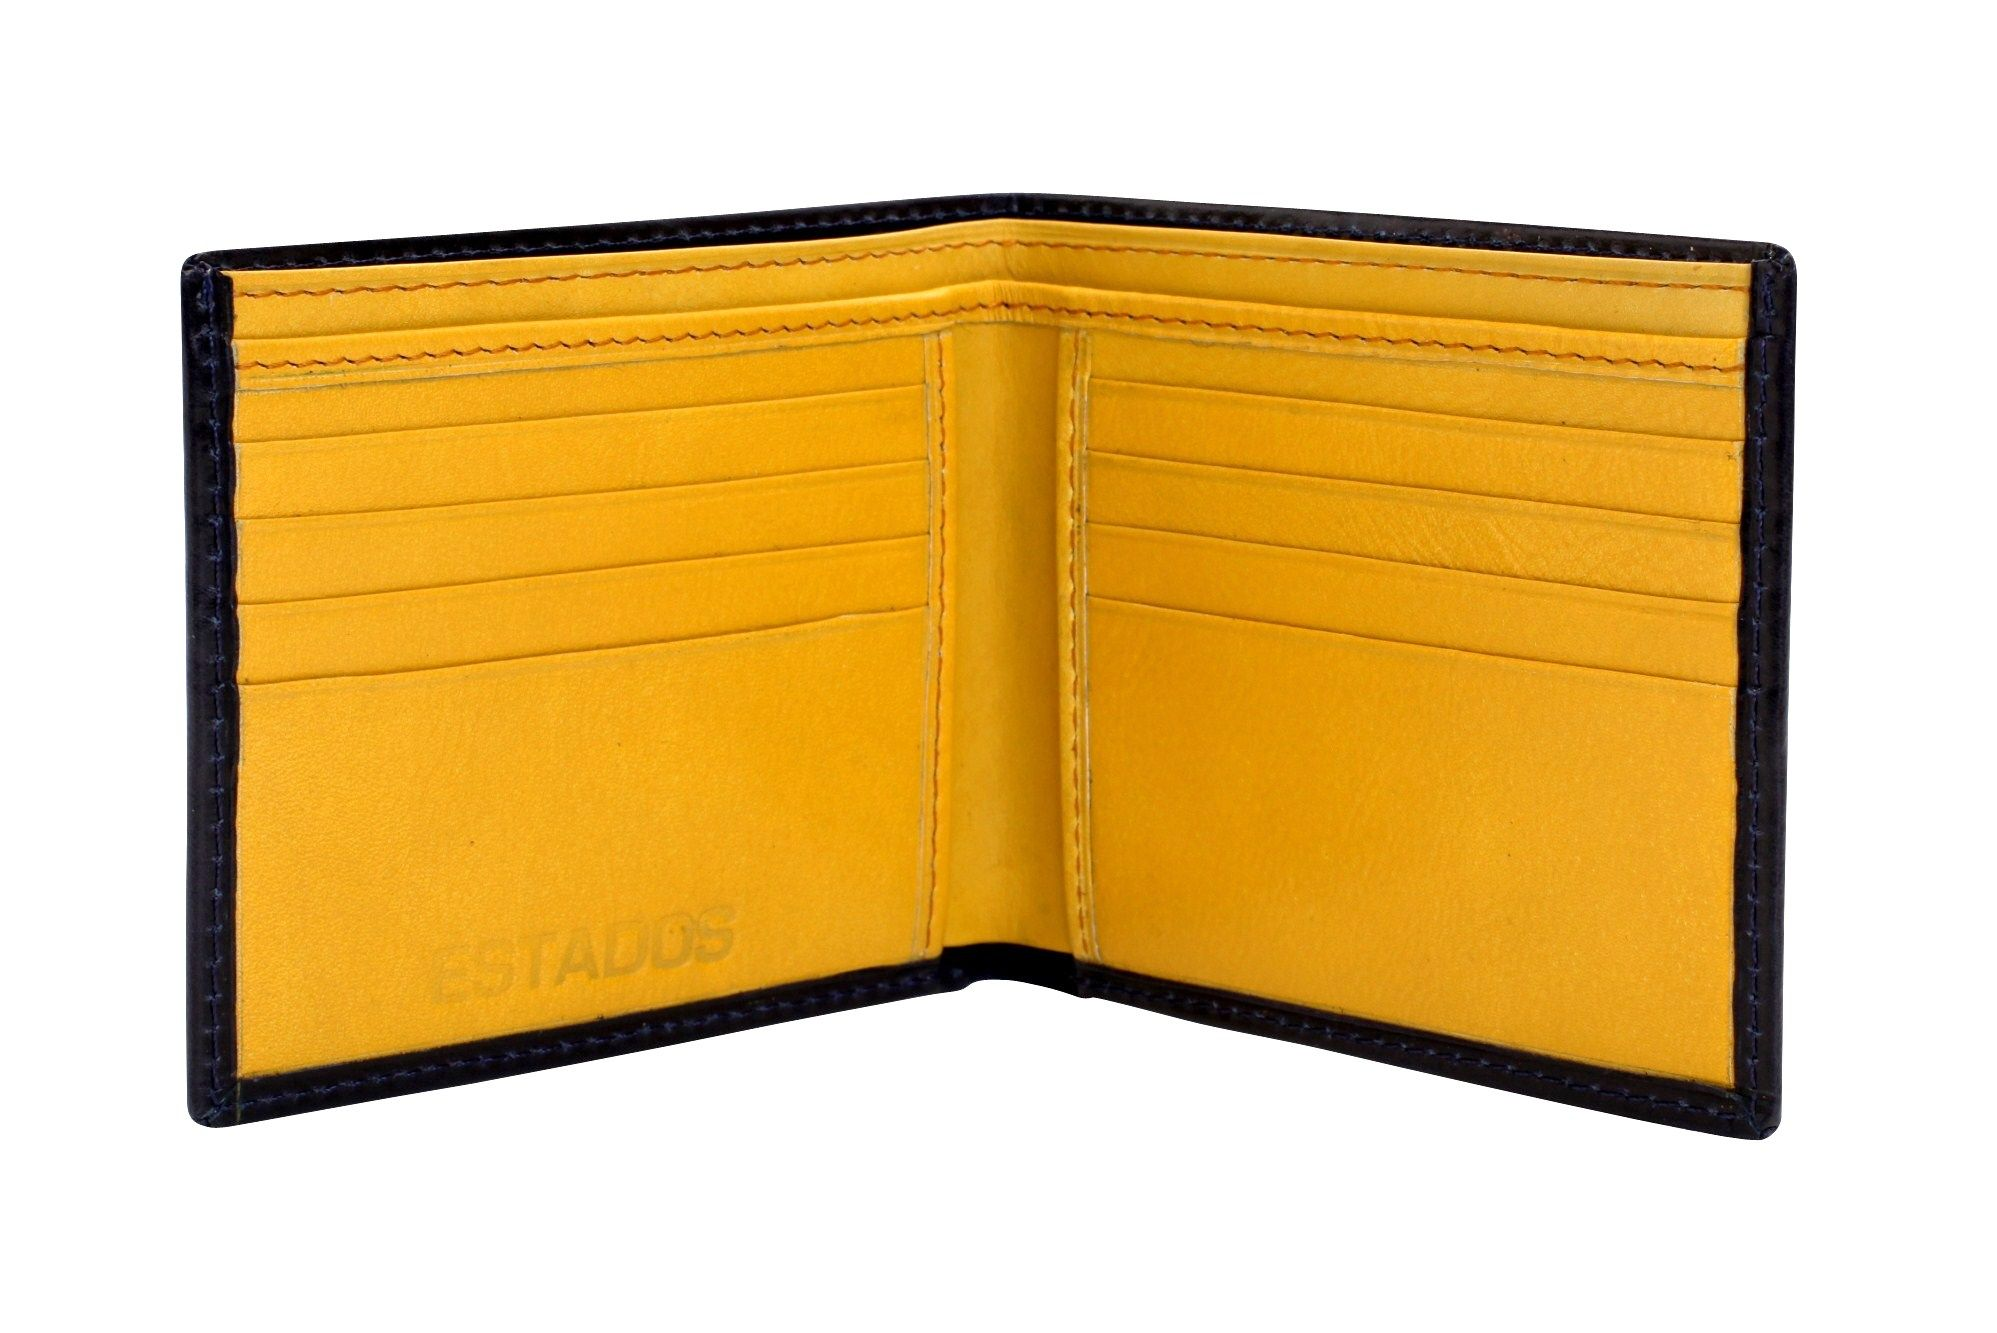 Dark navy and golden yellow leather wallet estados